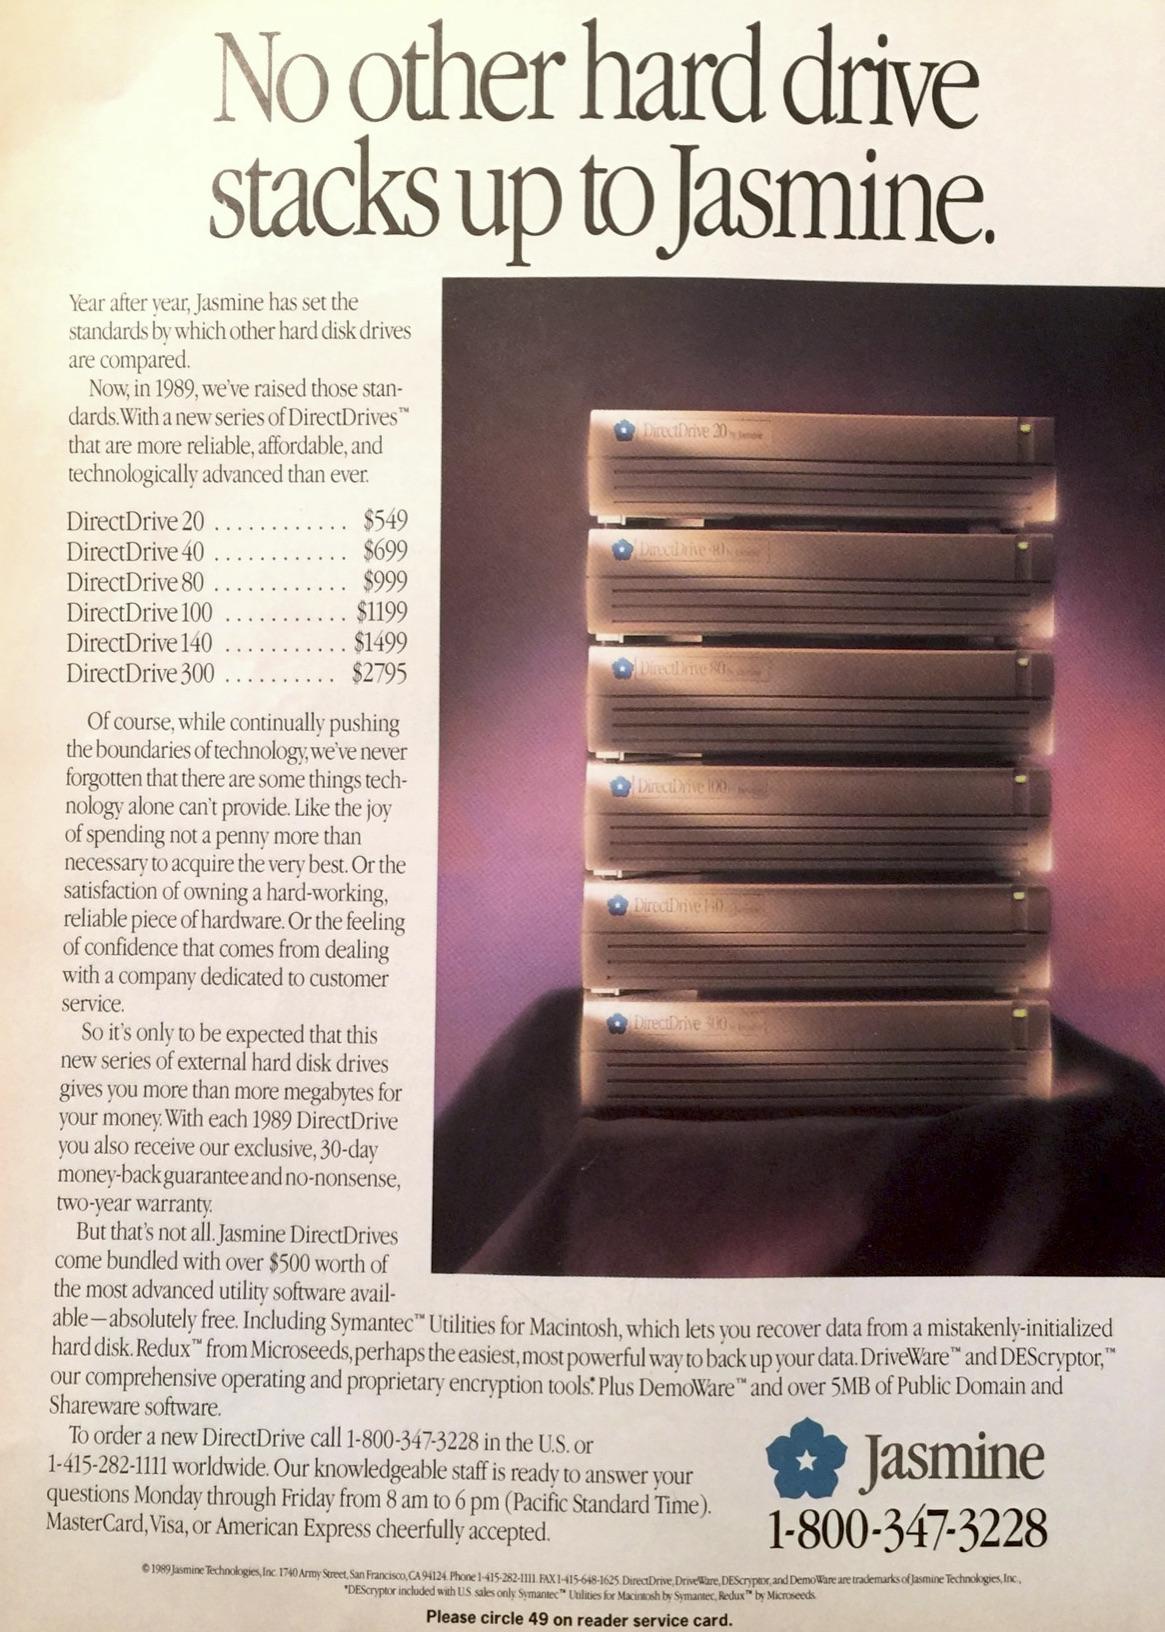 JASMINE DIRECTDRIVE AD FROM JUNE 1989 MacUser MAGAZINE